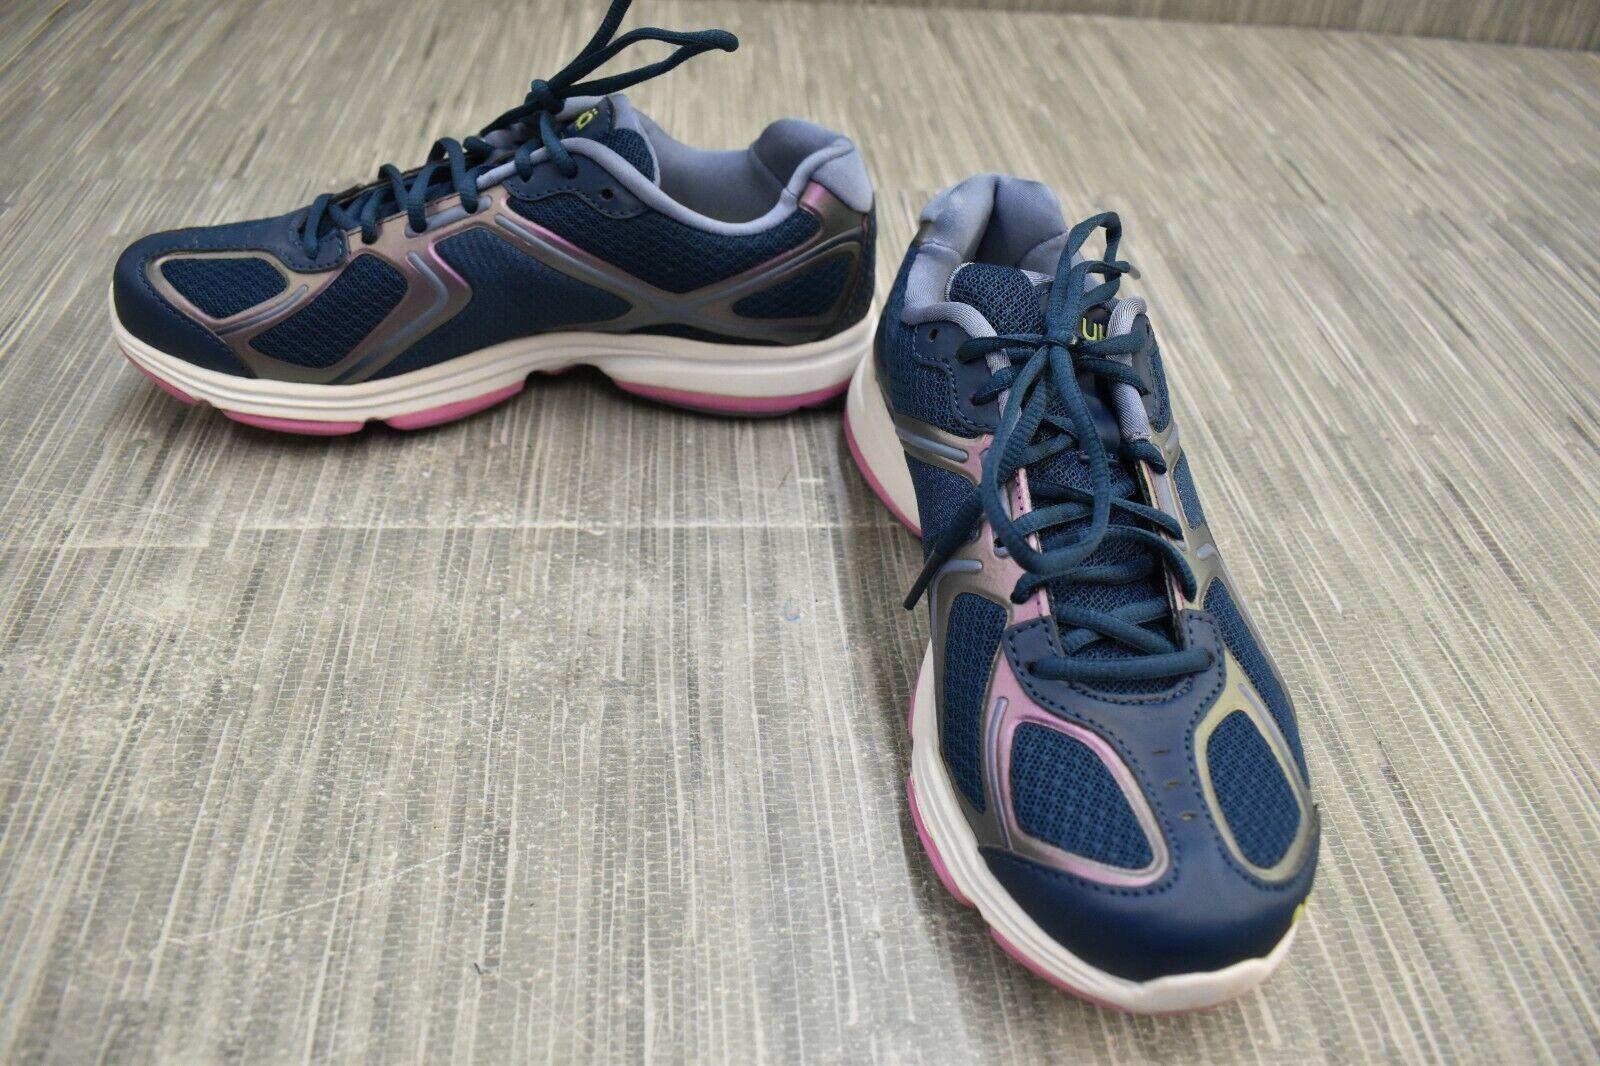 Ryka Devotion Walking Chaussures de sport, femme taille 7 m, bleu marine